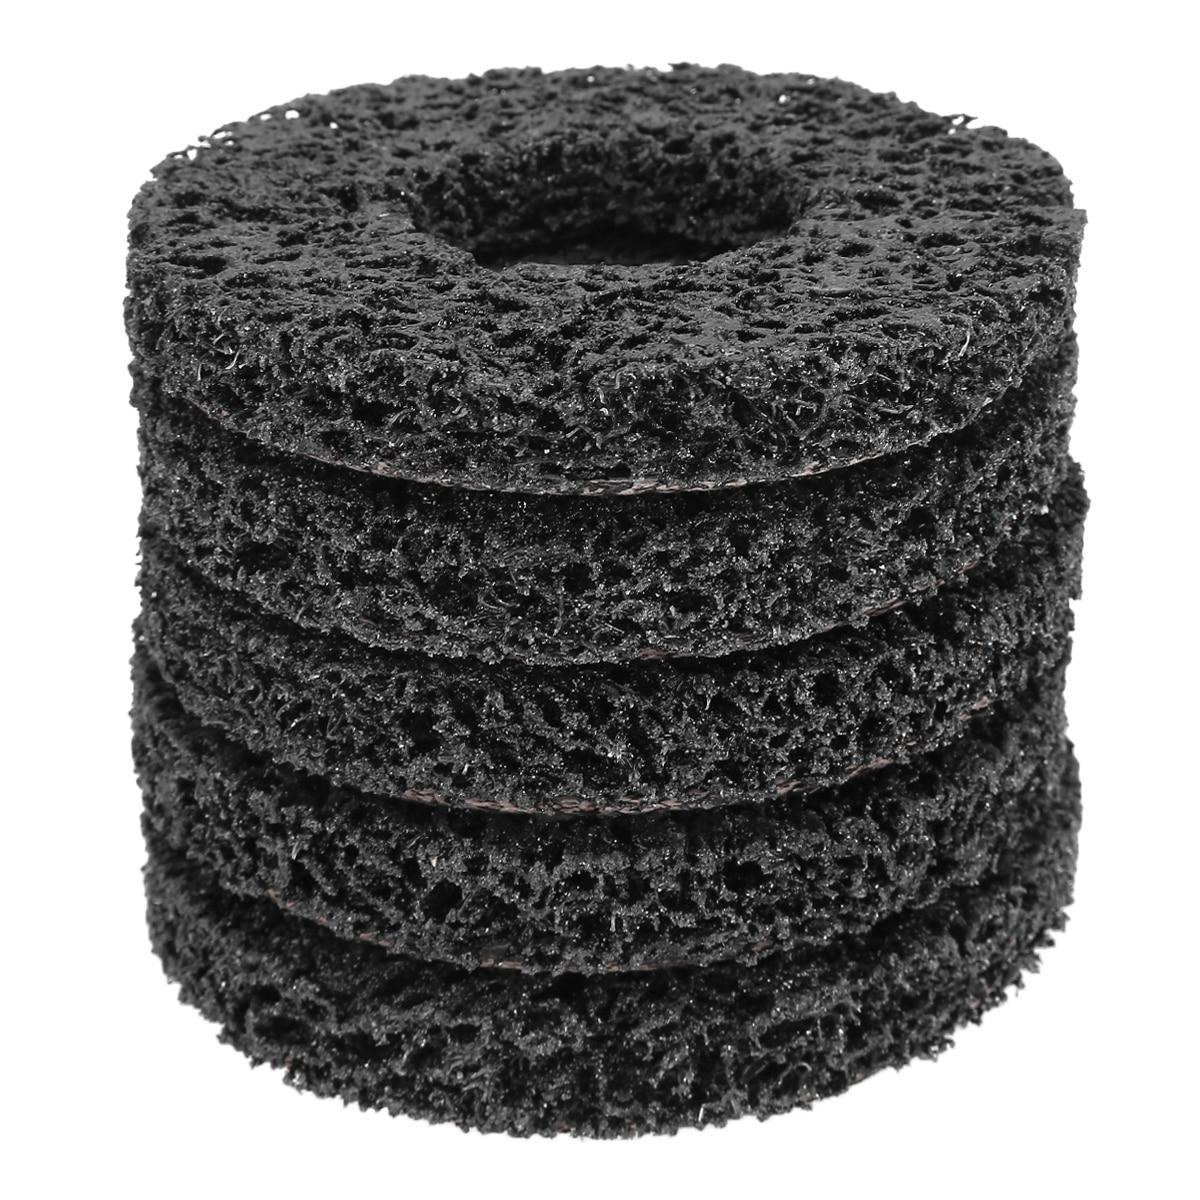 5Pcs Strip Disc Grit Polishing Grinding Wheel Pad Angle Grinder Car Paint Rust Clean Abrasive Angle Grinding Wheel